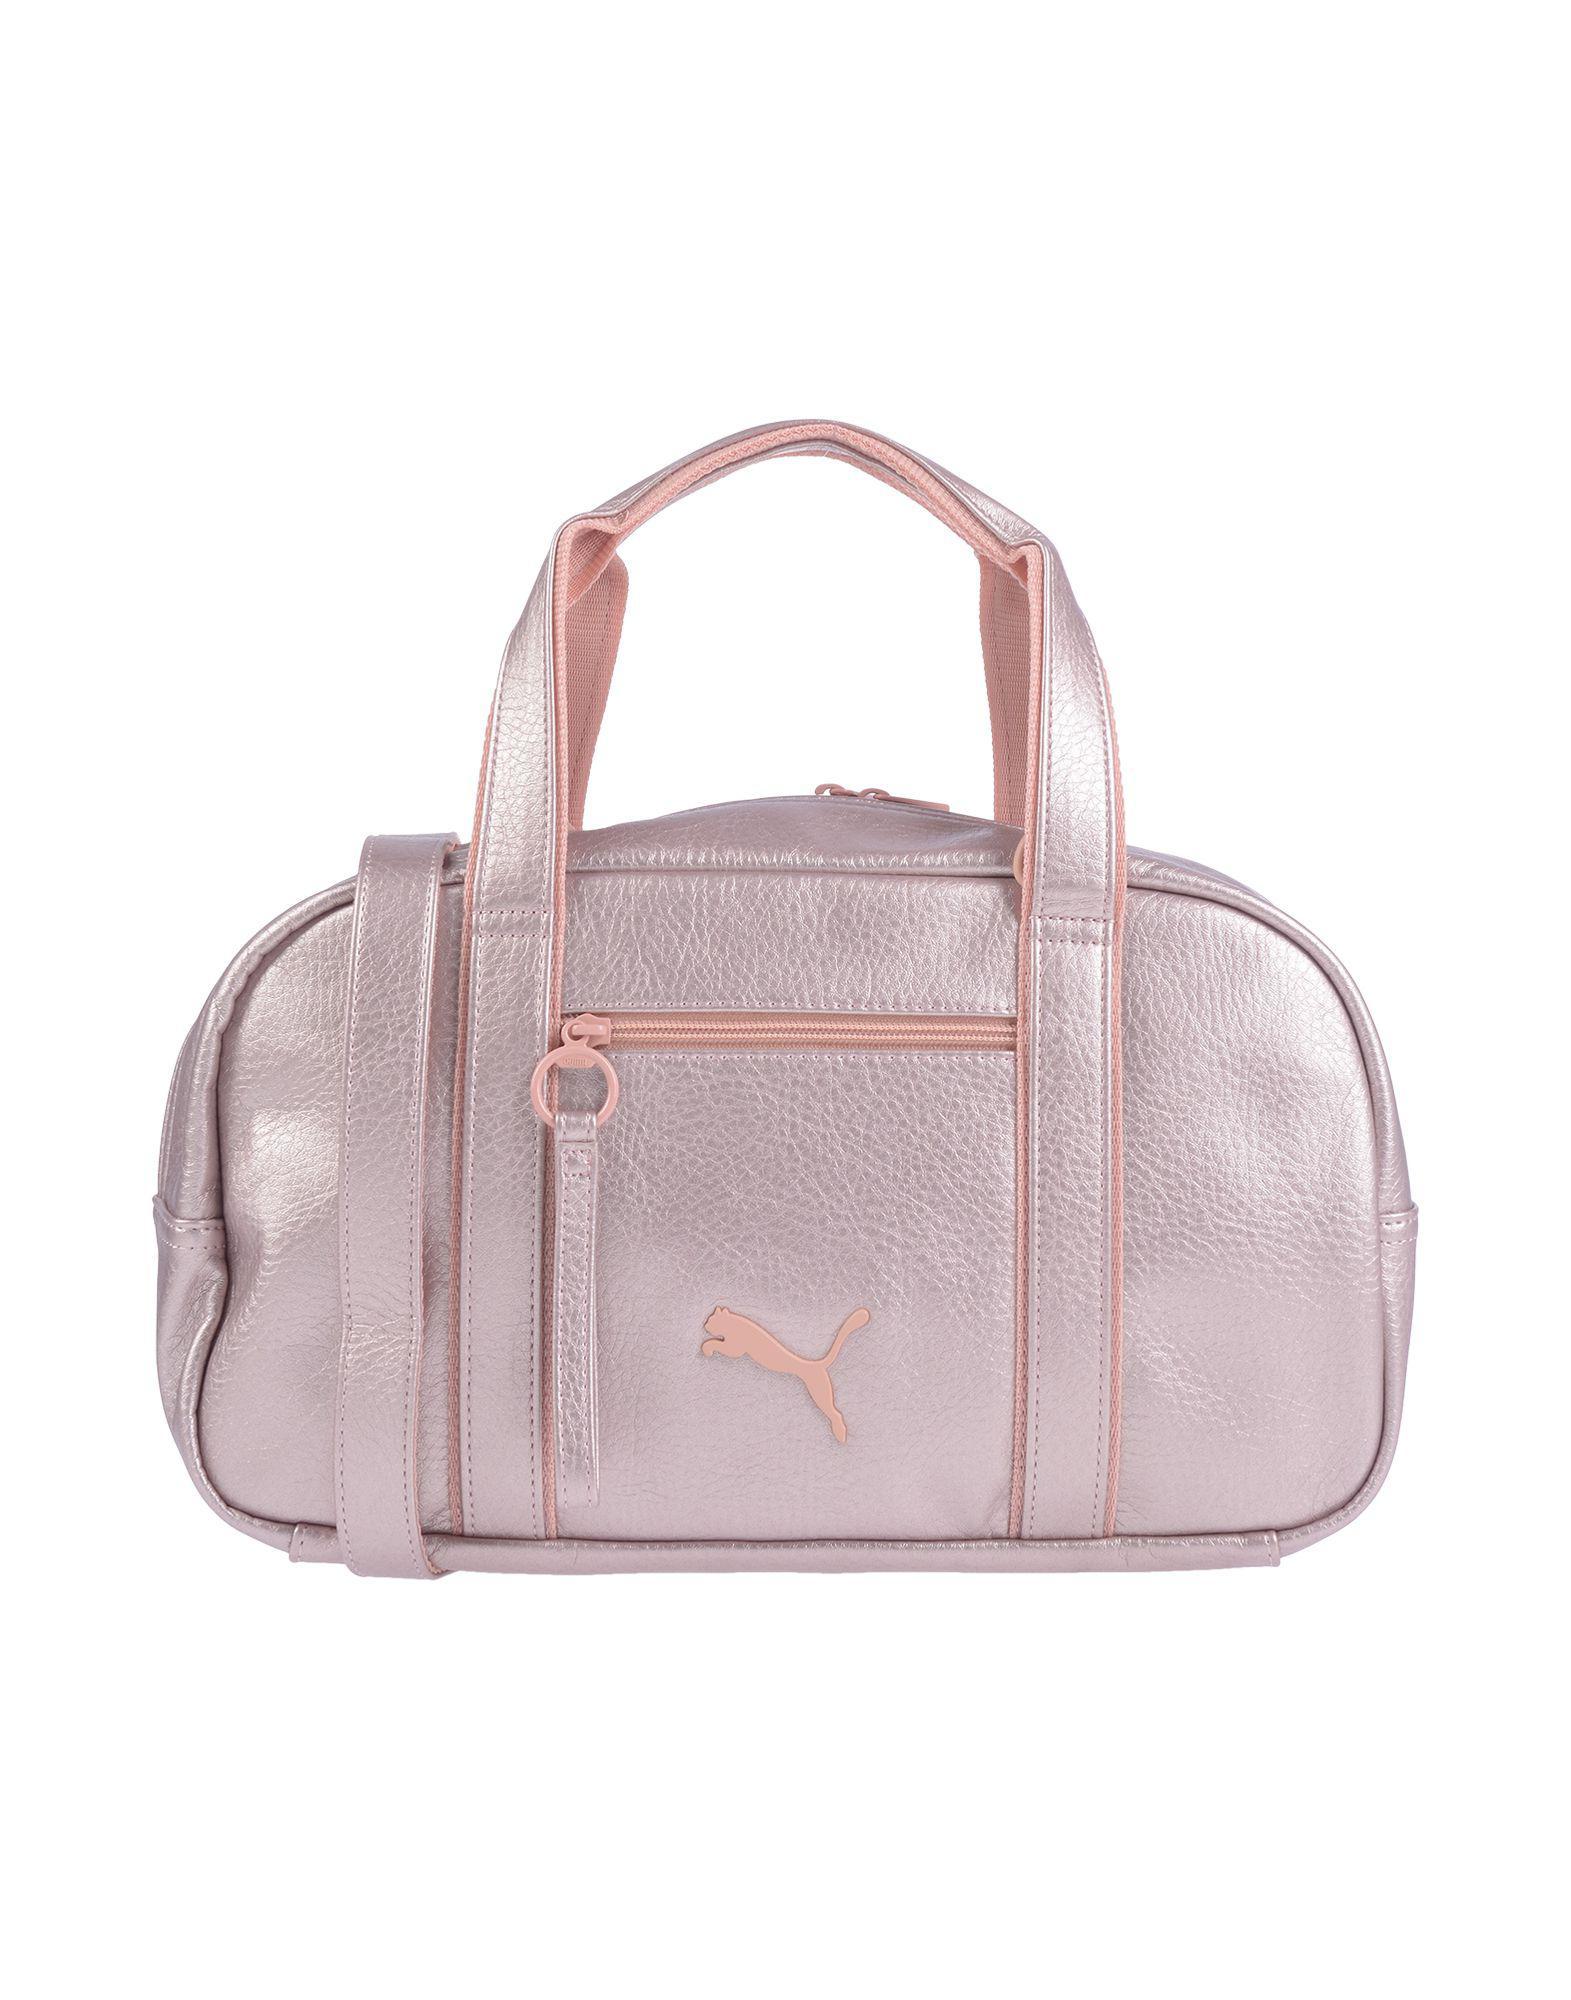 119c92304e PUMA Handbag in Pink - Lyst